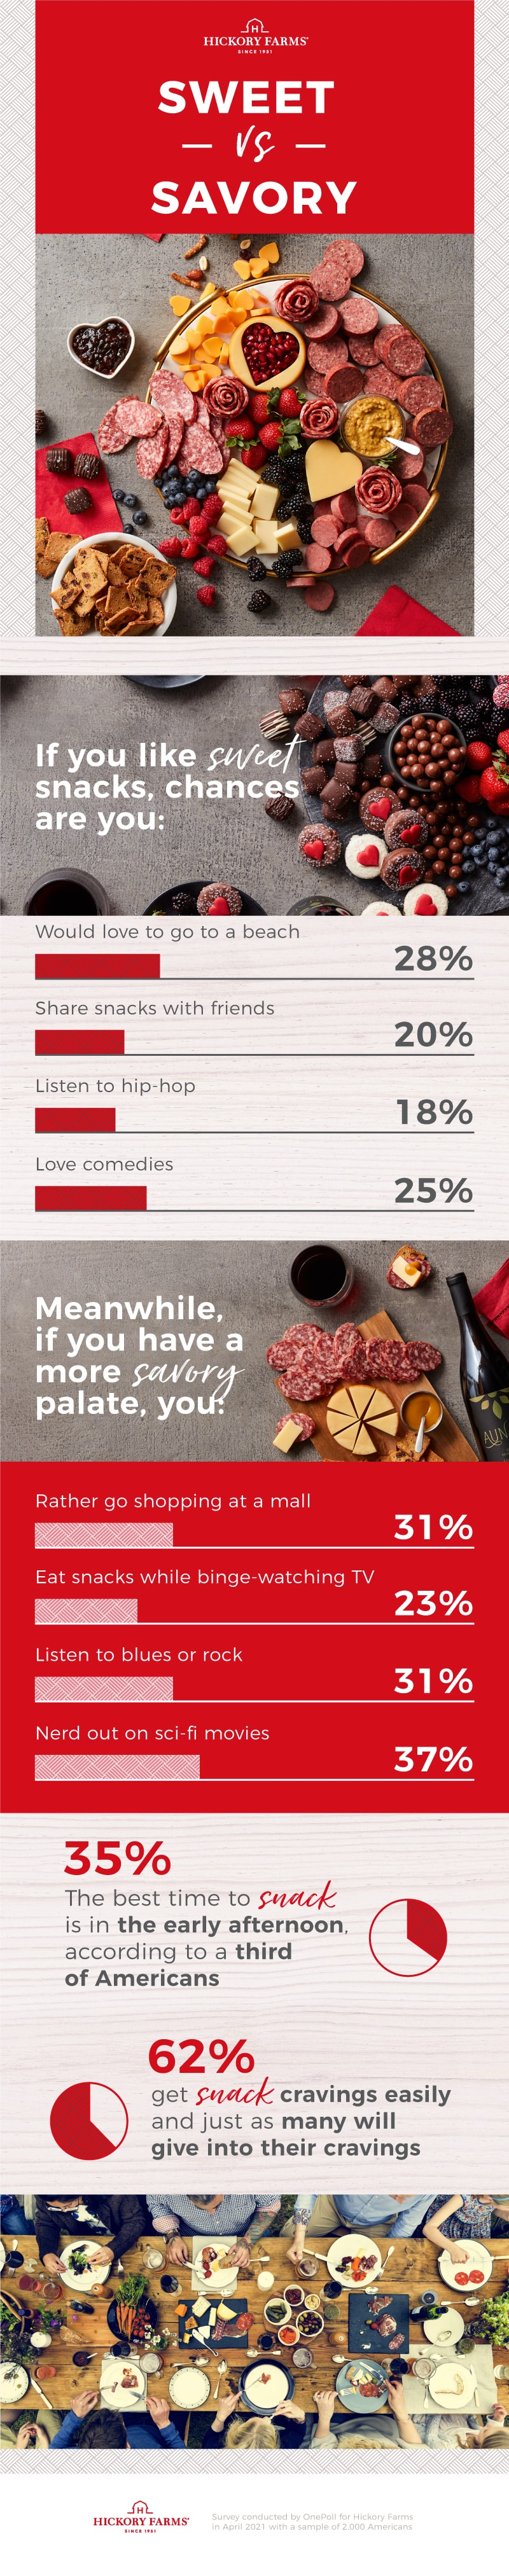 Sweet versus Savory Infographic